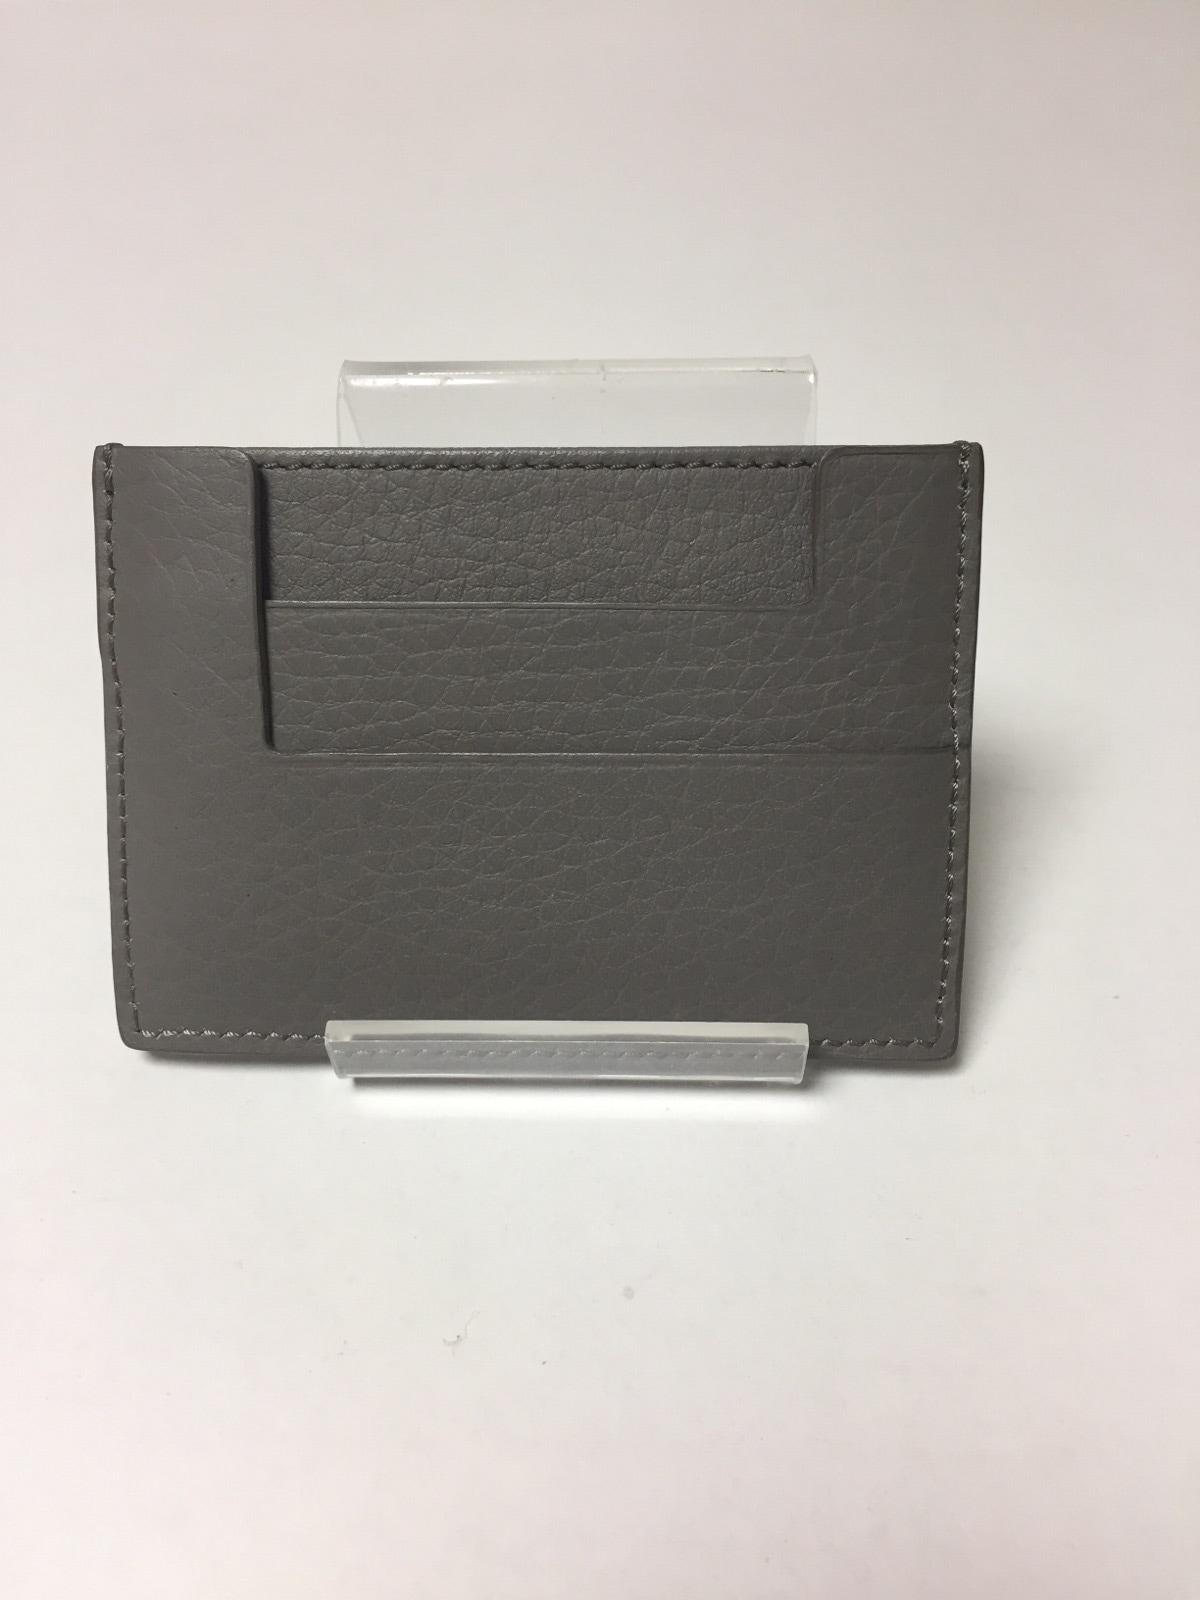 TOM FORD(トムフォード)のカードケース